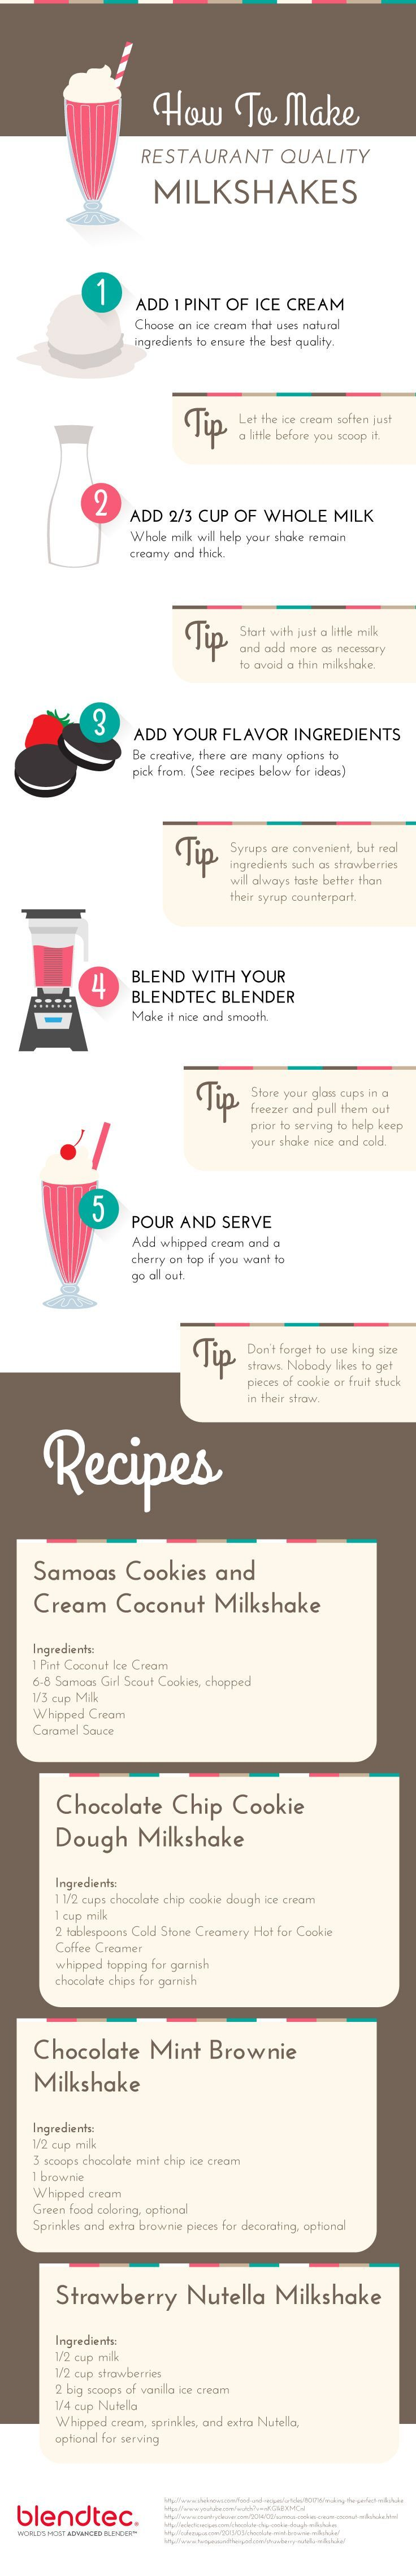 4 Thick Milkshake Recipes